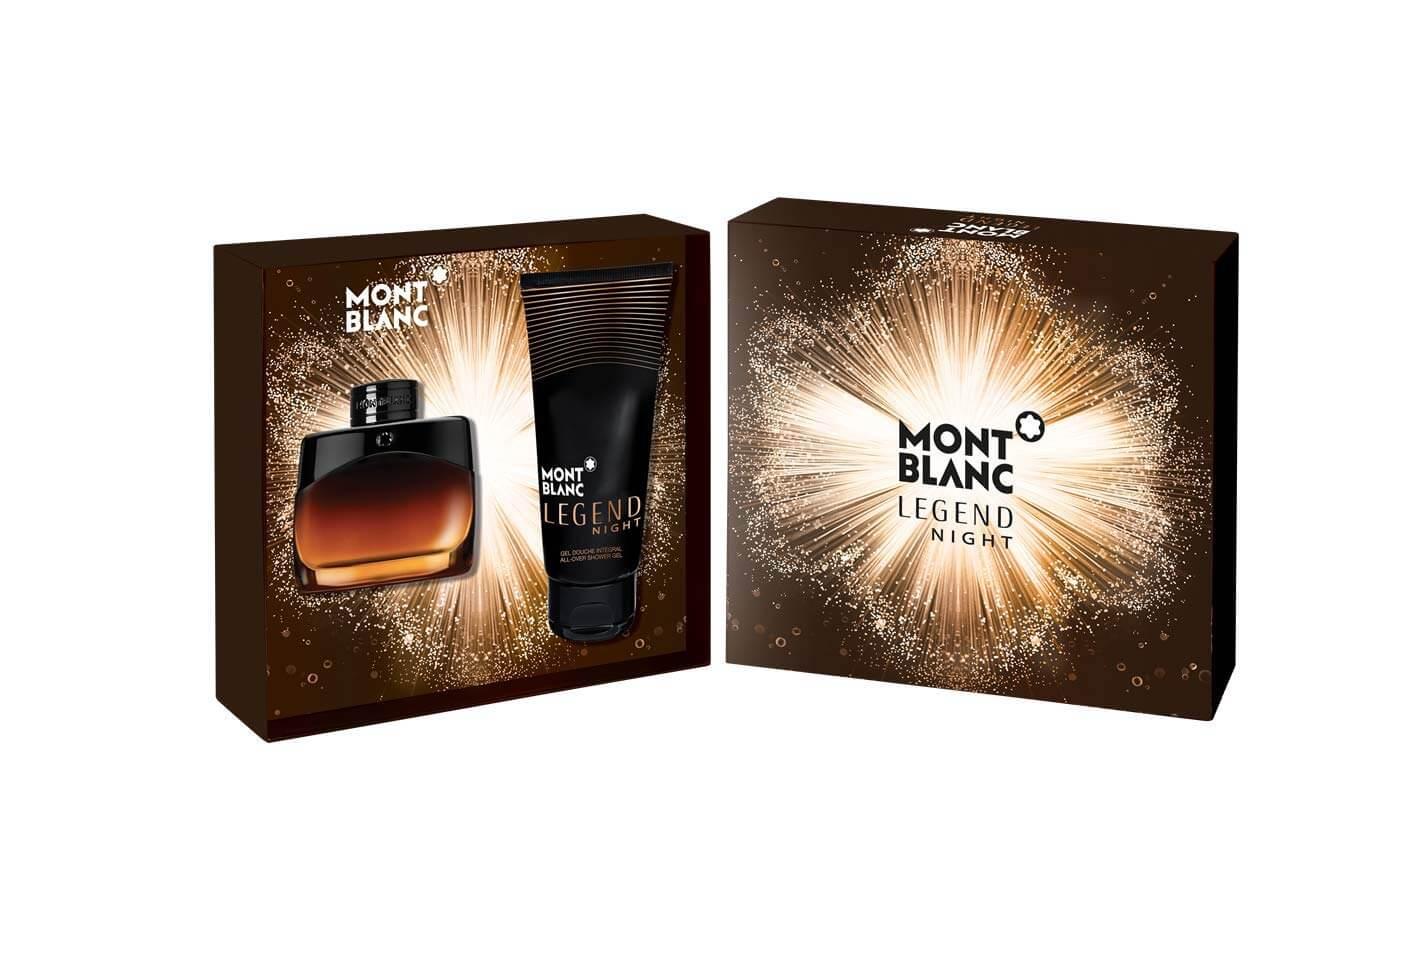 Montblanc Legend Night Gift Set : Eau De Parfum 50ml / Shower Gel 100ml